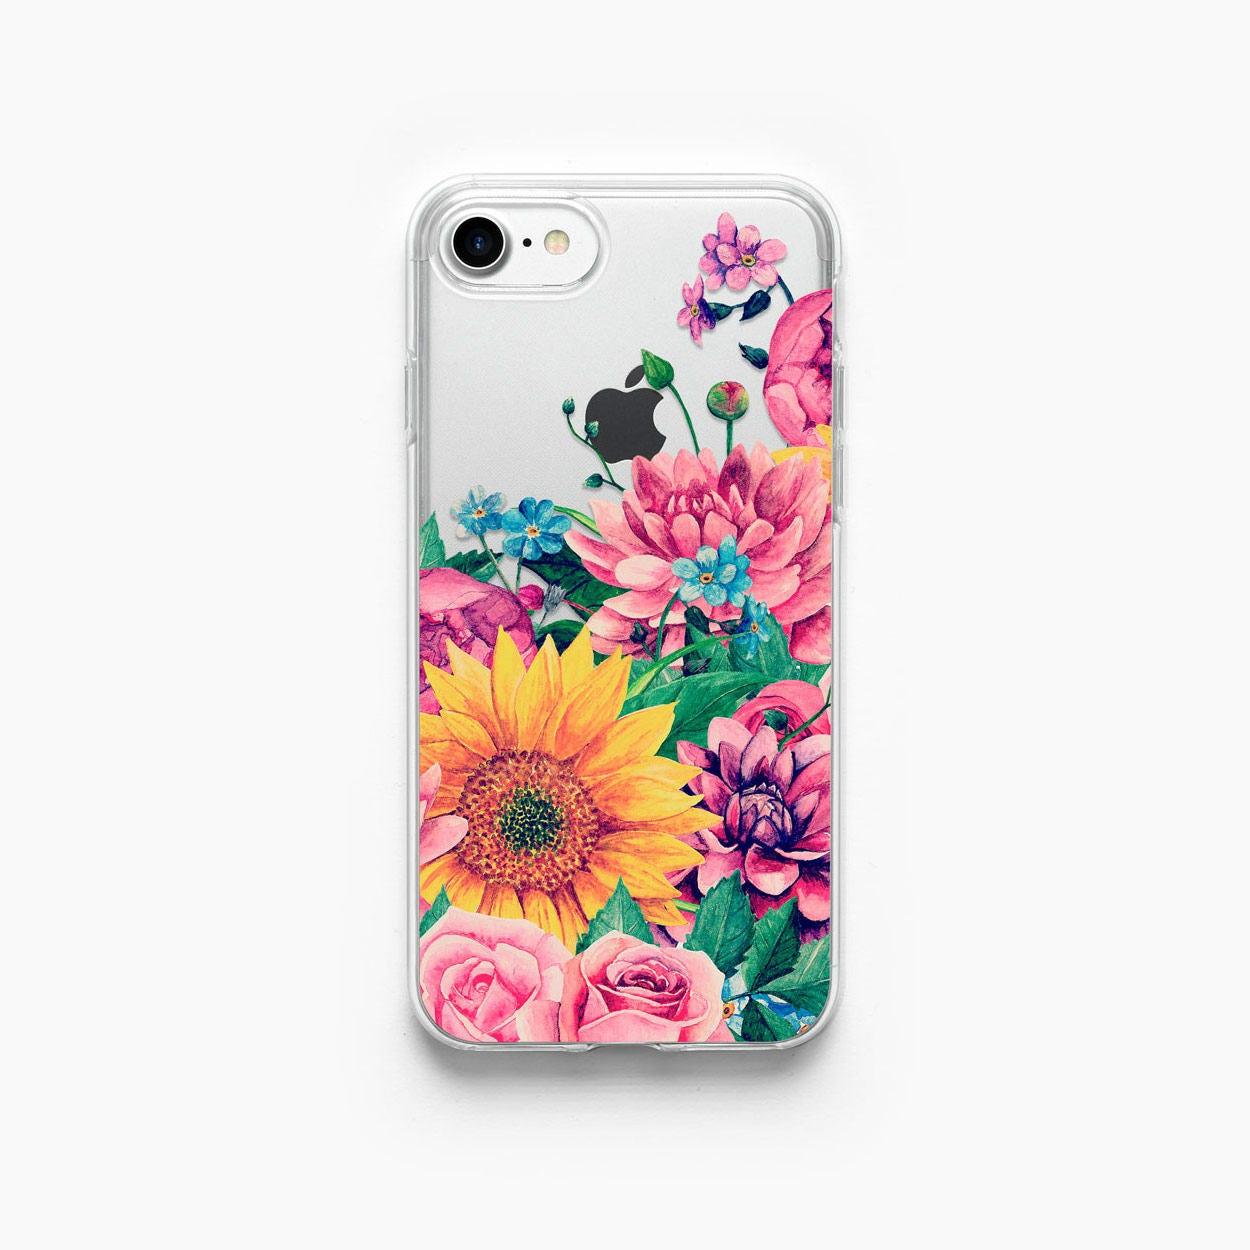 iPhone 7 Case Sunflower Floral iPhone 6 Case iPhone 7 Plus ...